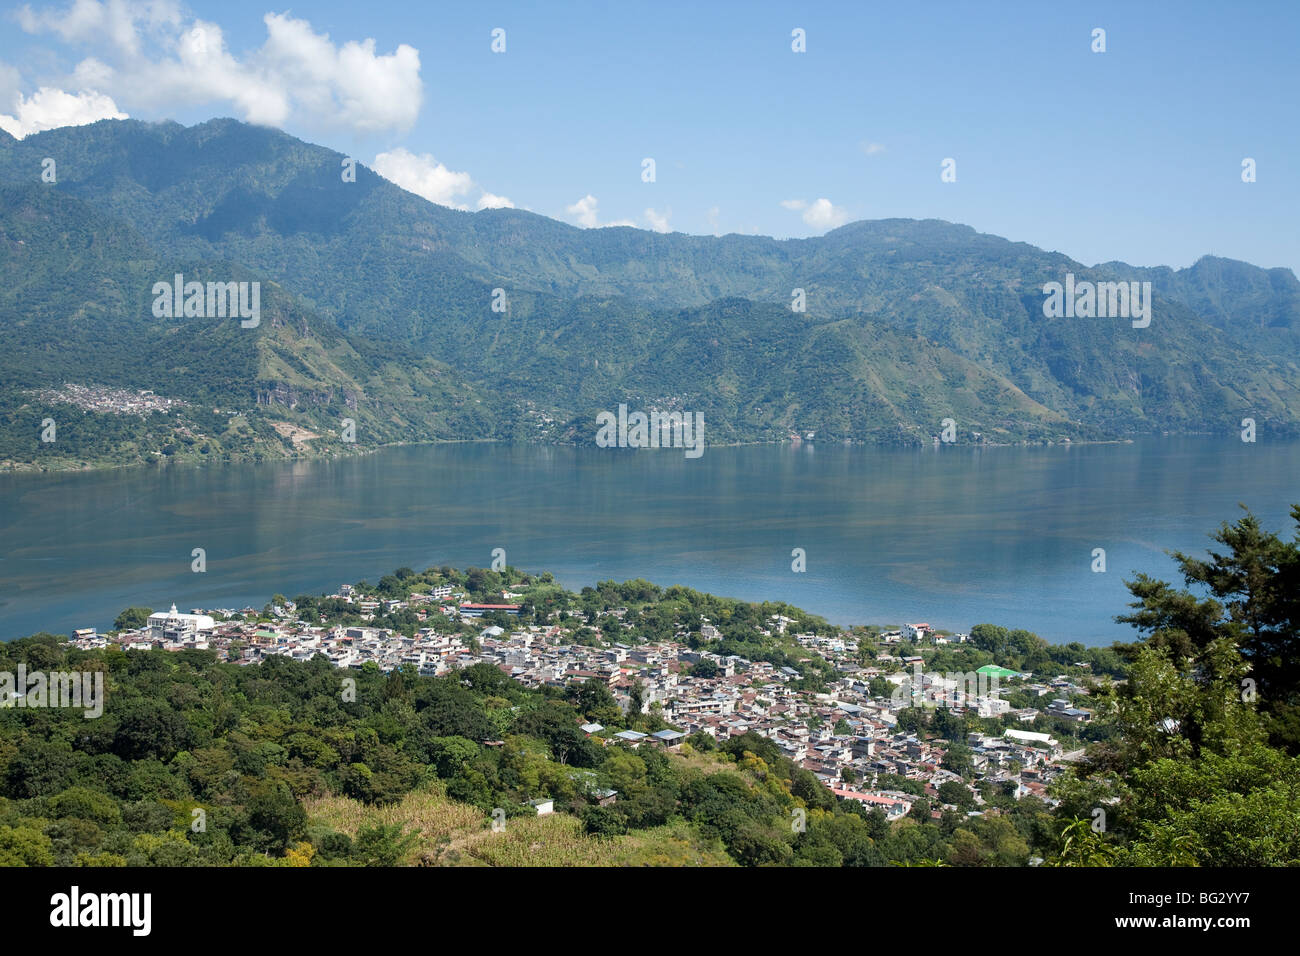 San Pedro La Laguna at Lake Atitlan Guatemala. - Stock Image